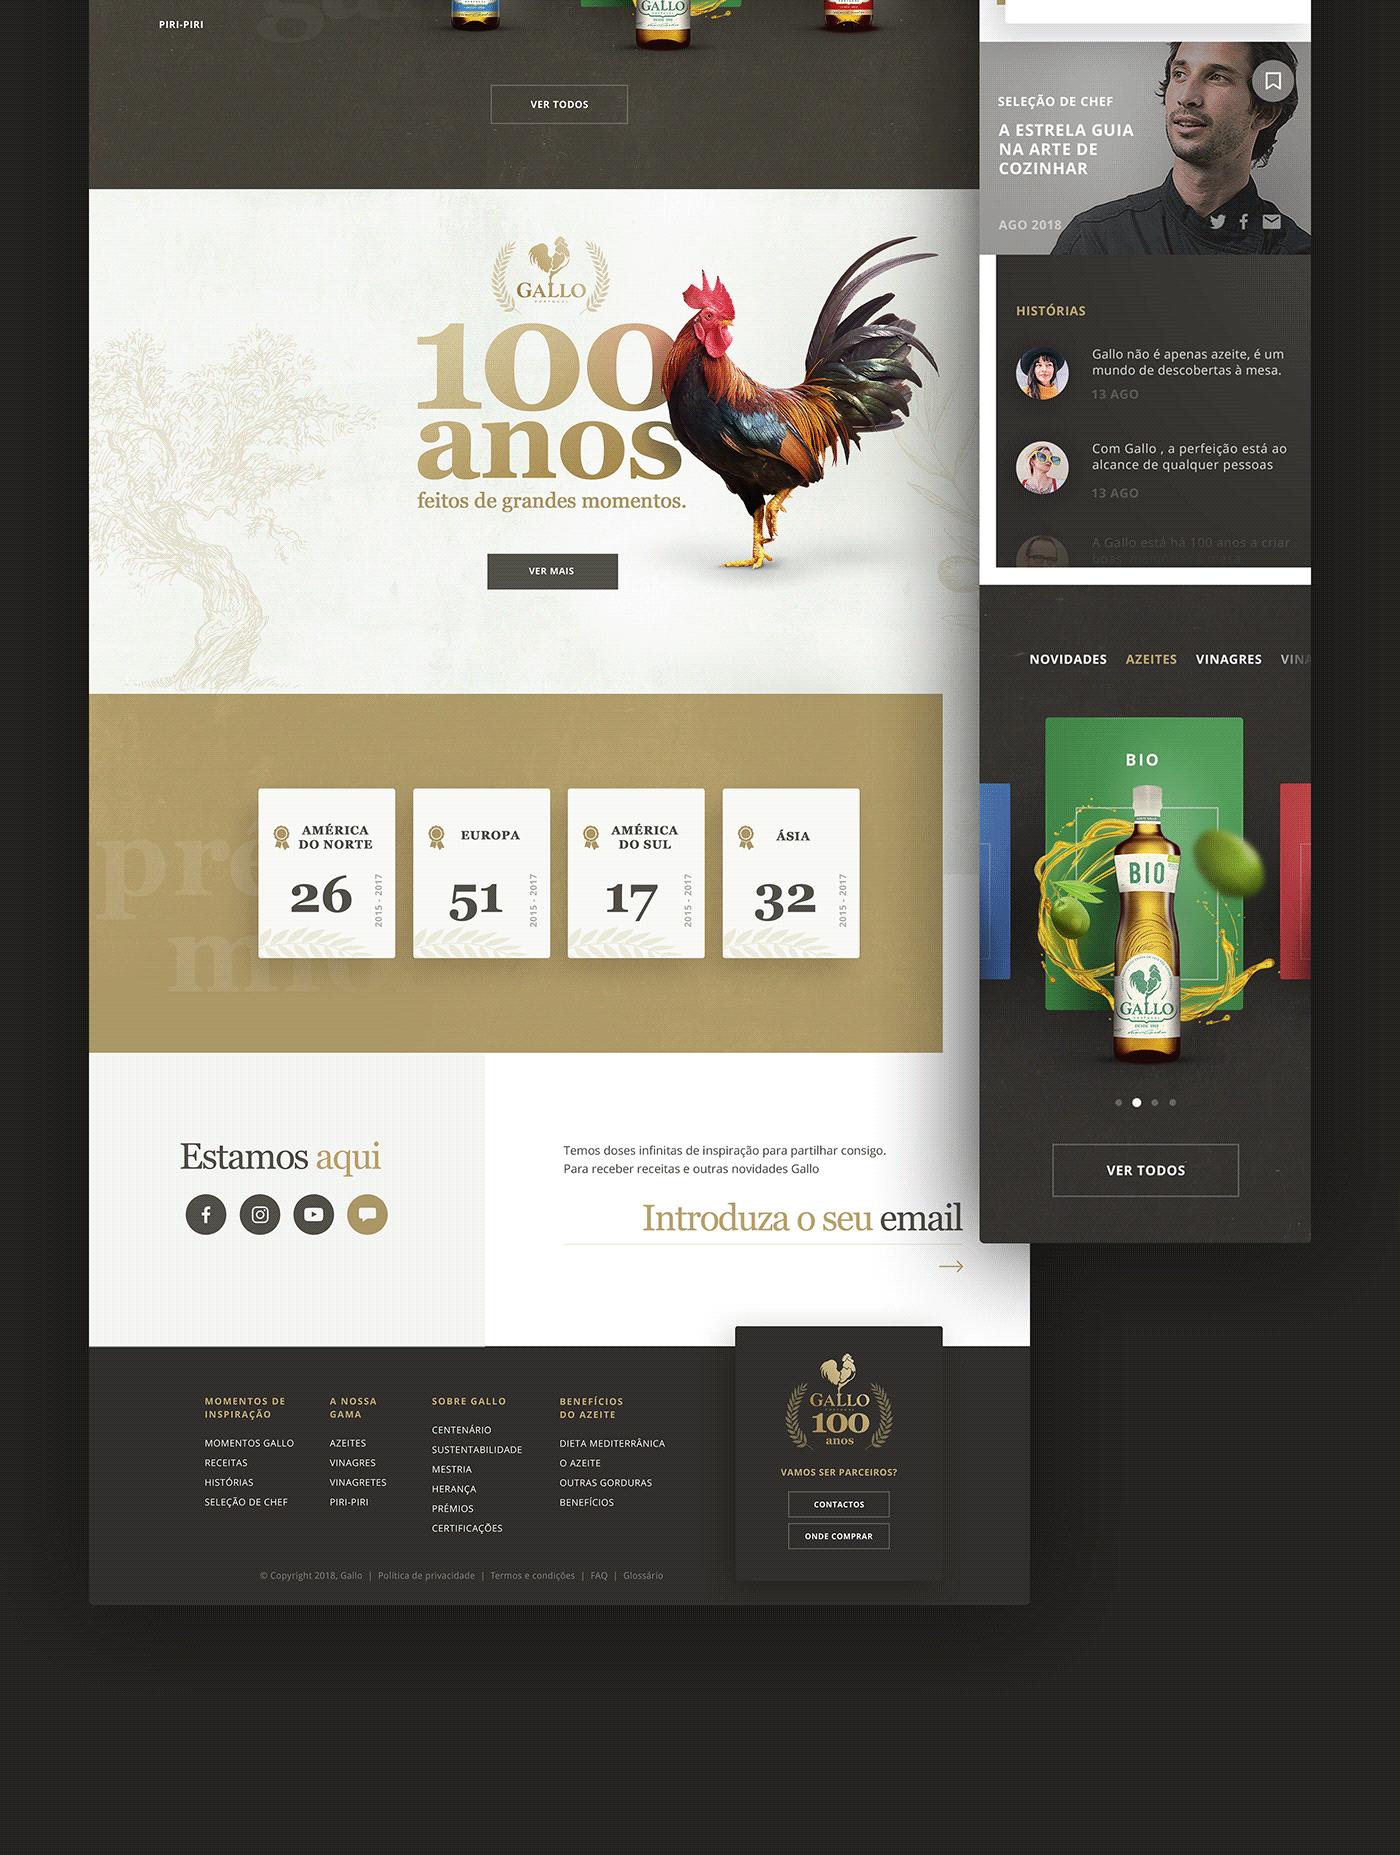 ux UI Interface user Experience graphic gallo oliveoil AZEITE filipesj